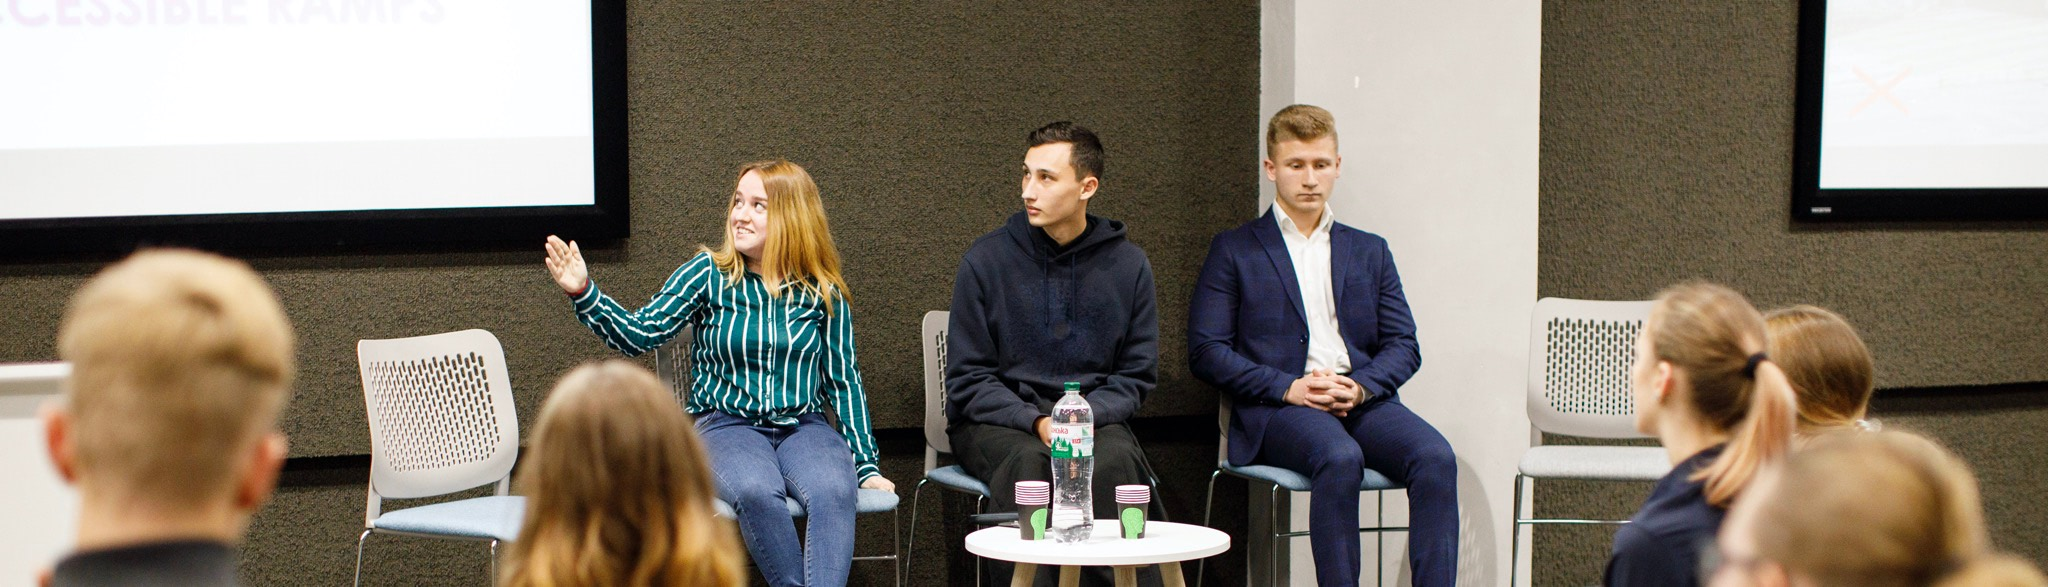 studentska-konferencziya-z-anglijskoyi-movy-13-aspect-ratio-1920x550